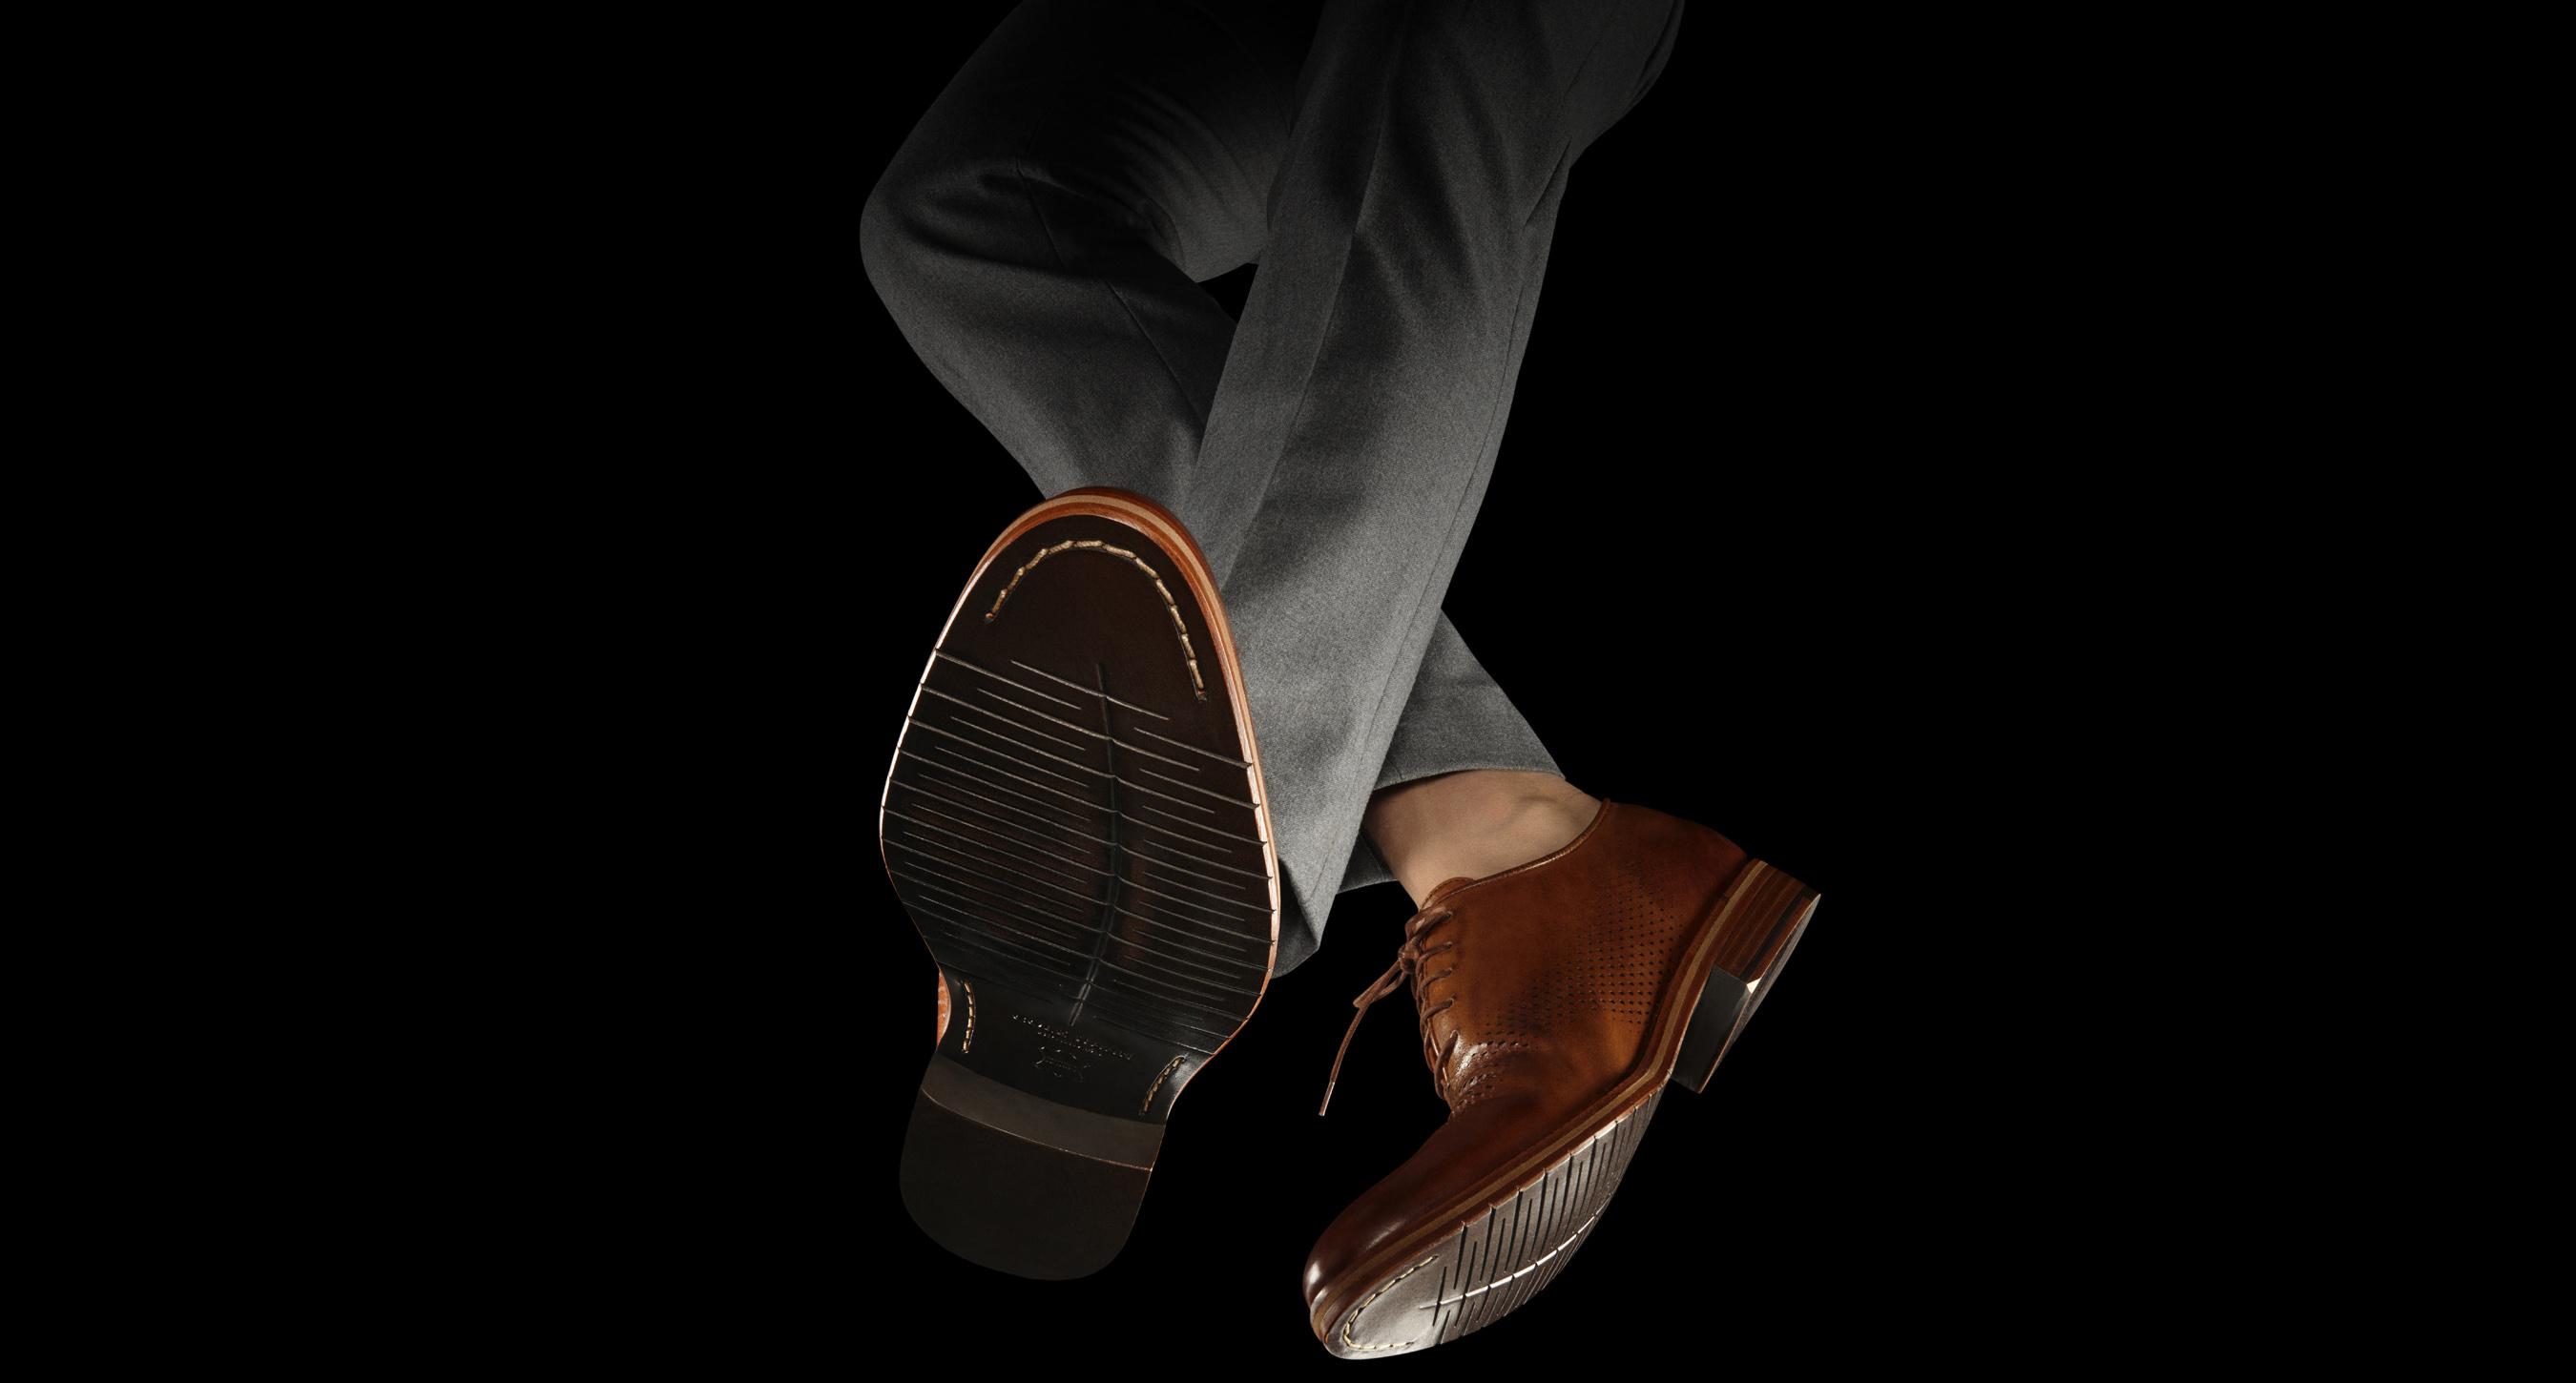 Cole Haan Reinvents Dress Footwear for